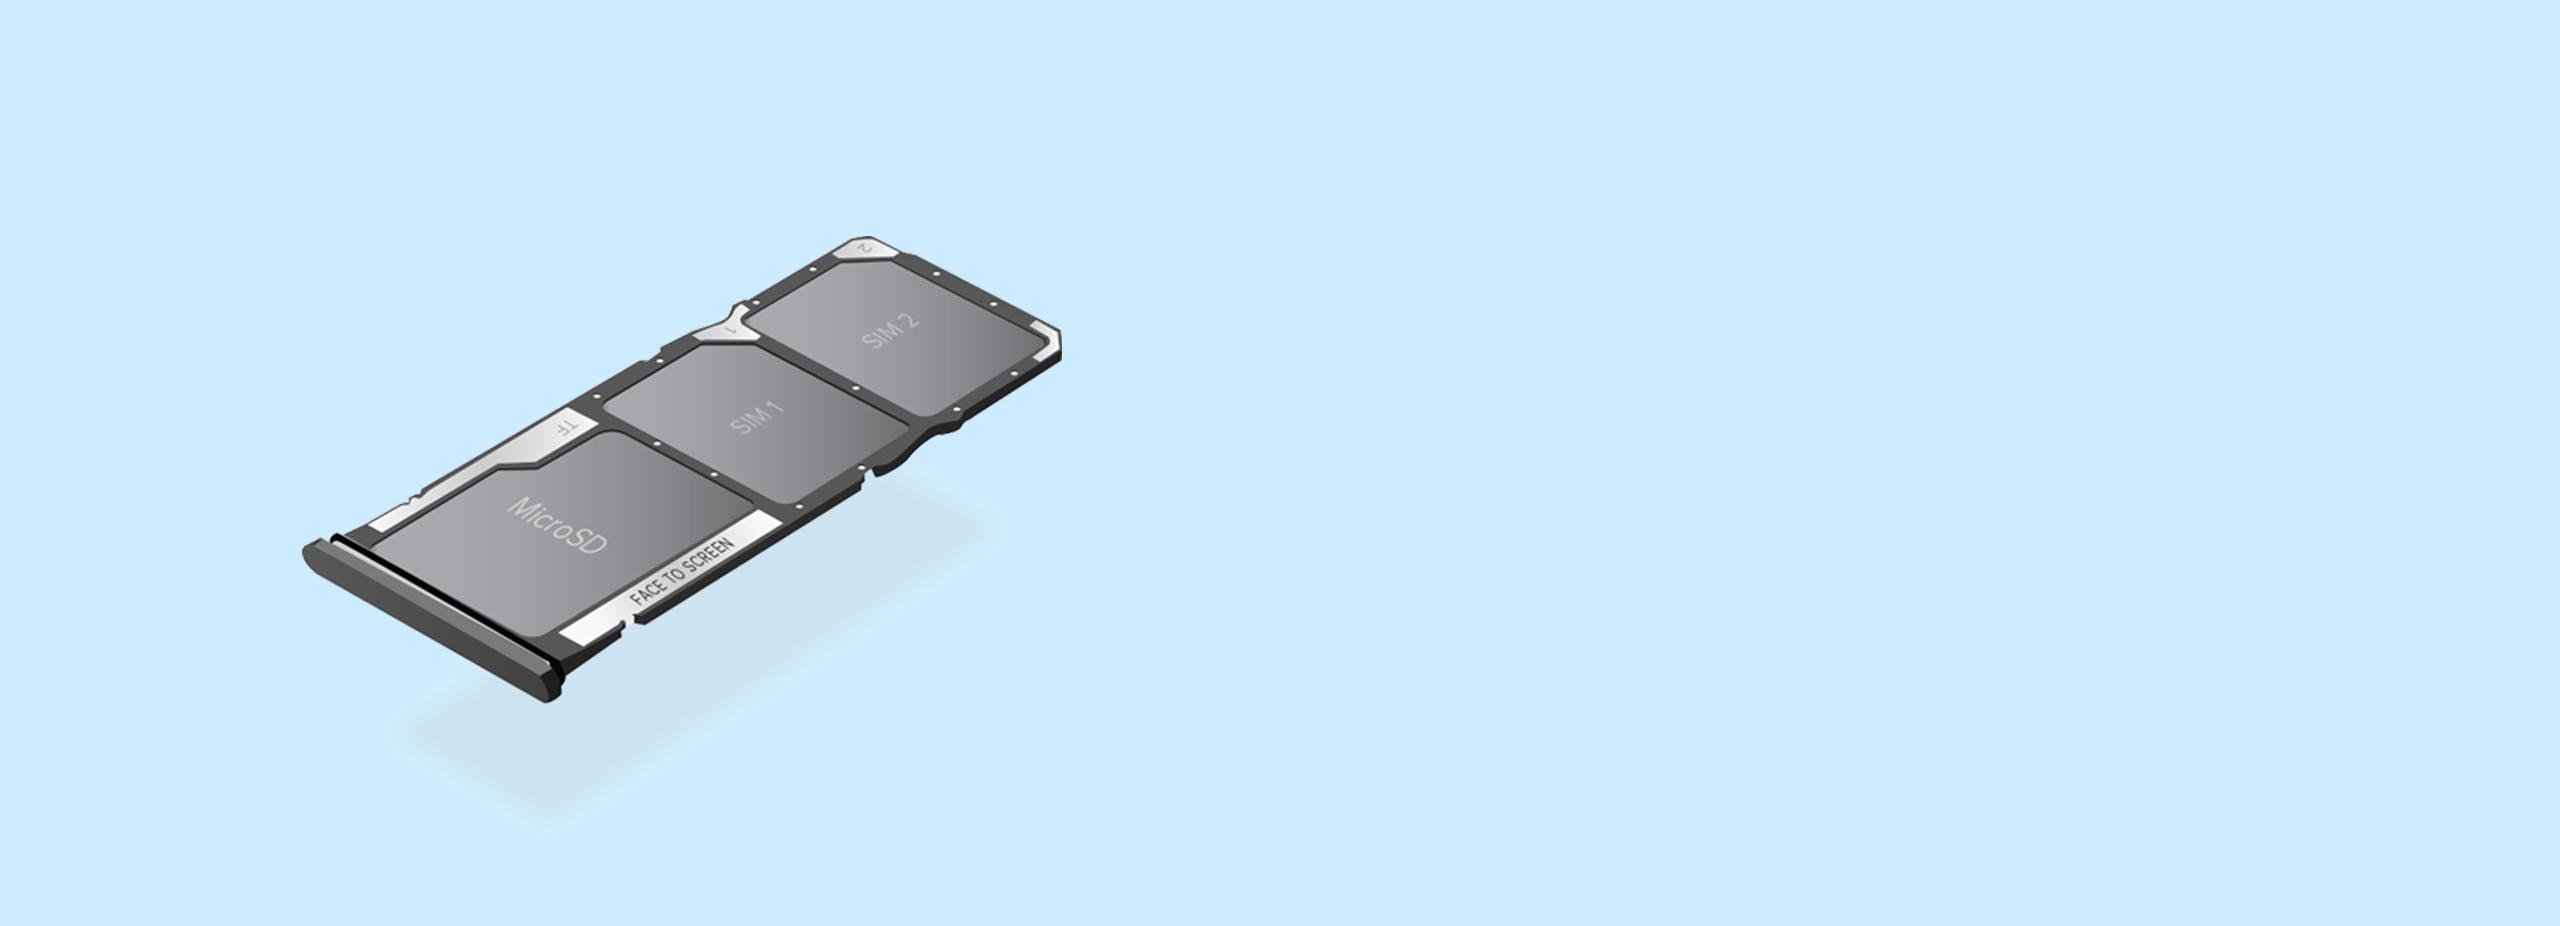 Redmi Y3 - 32MP Super Selfie Camera @₹9,999 - Mi India